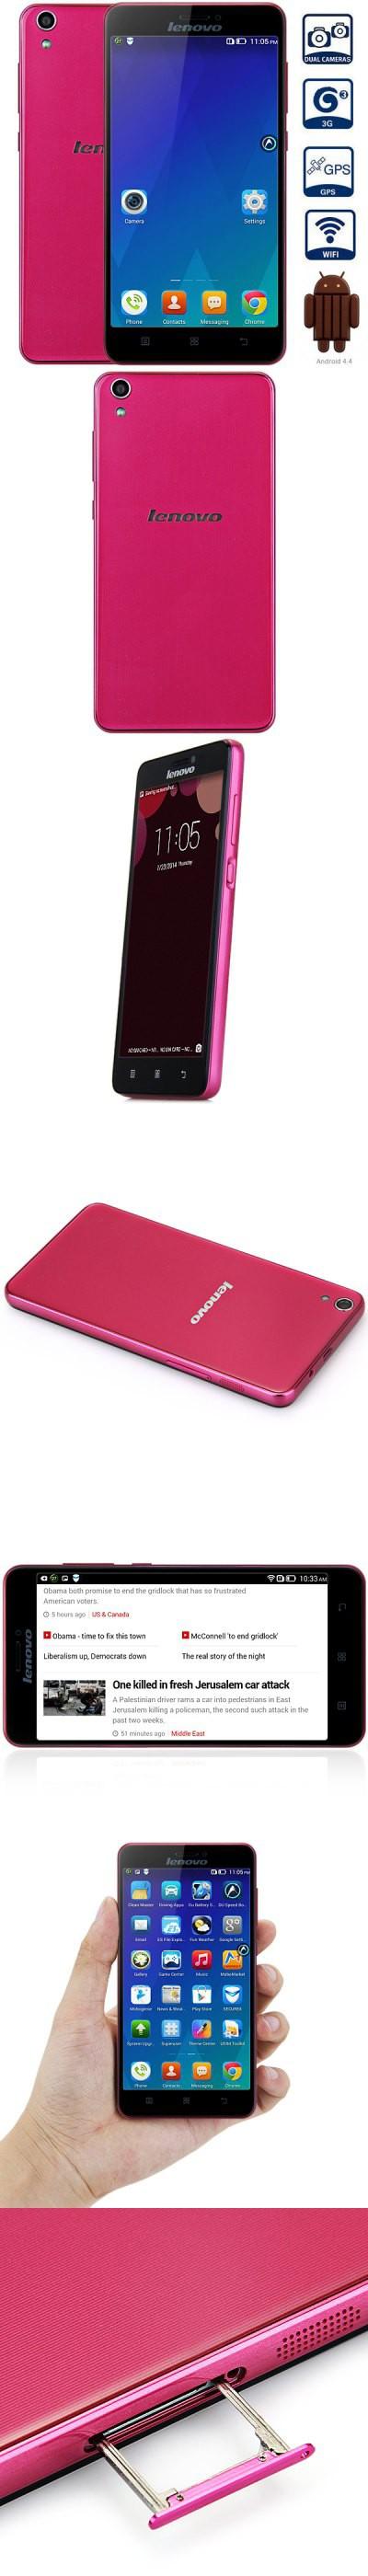 Lenovo S850 50 Inch Android 44 3g Phablet Mtk6582 Quad Core Quadcore Processor 20373